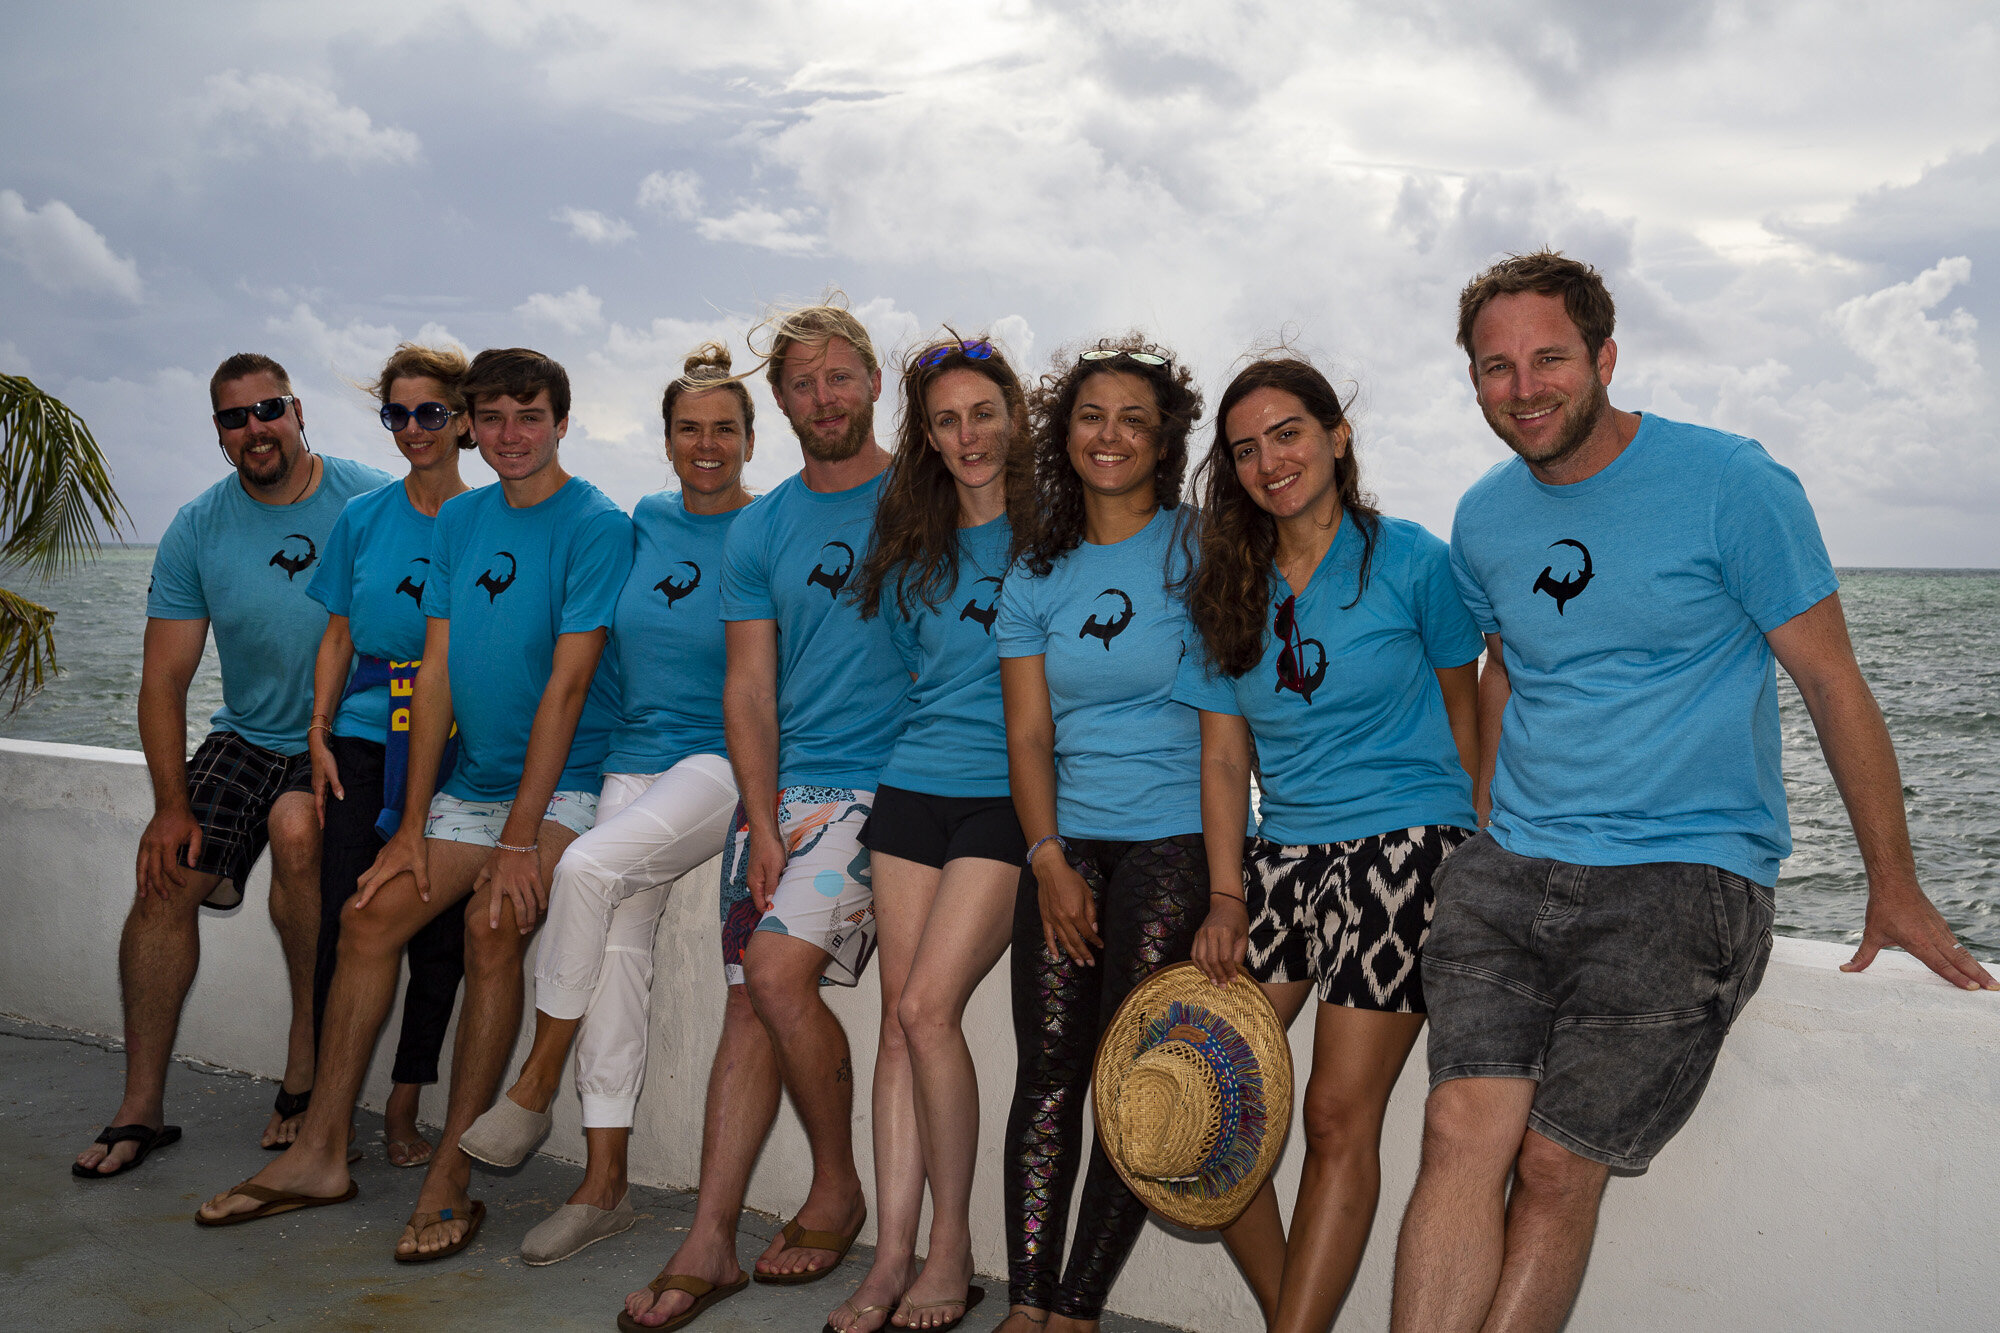 Silent Hunter - Annie Dr Tristan Guttridge -Sharks - Shark - Hammerhead - The Bahamas - Andros - Shark Diving - Eco - Eco Tourism - Team Shot.jpg